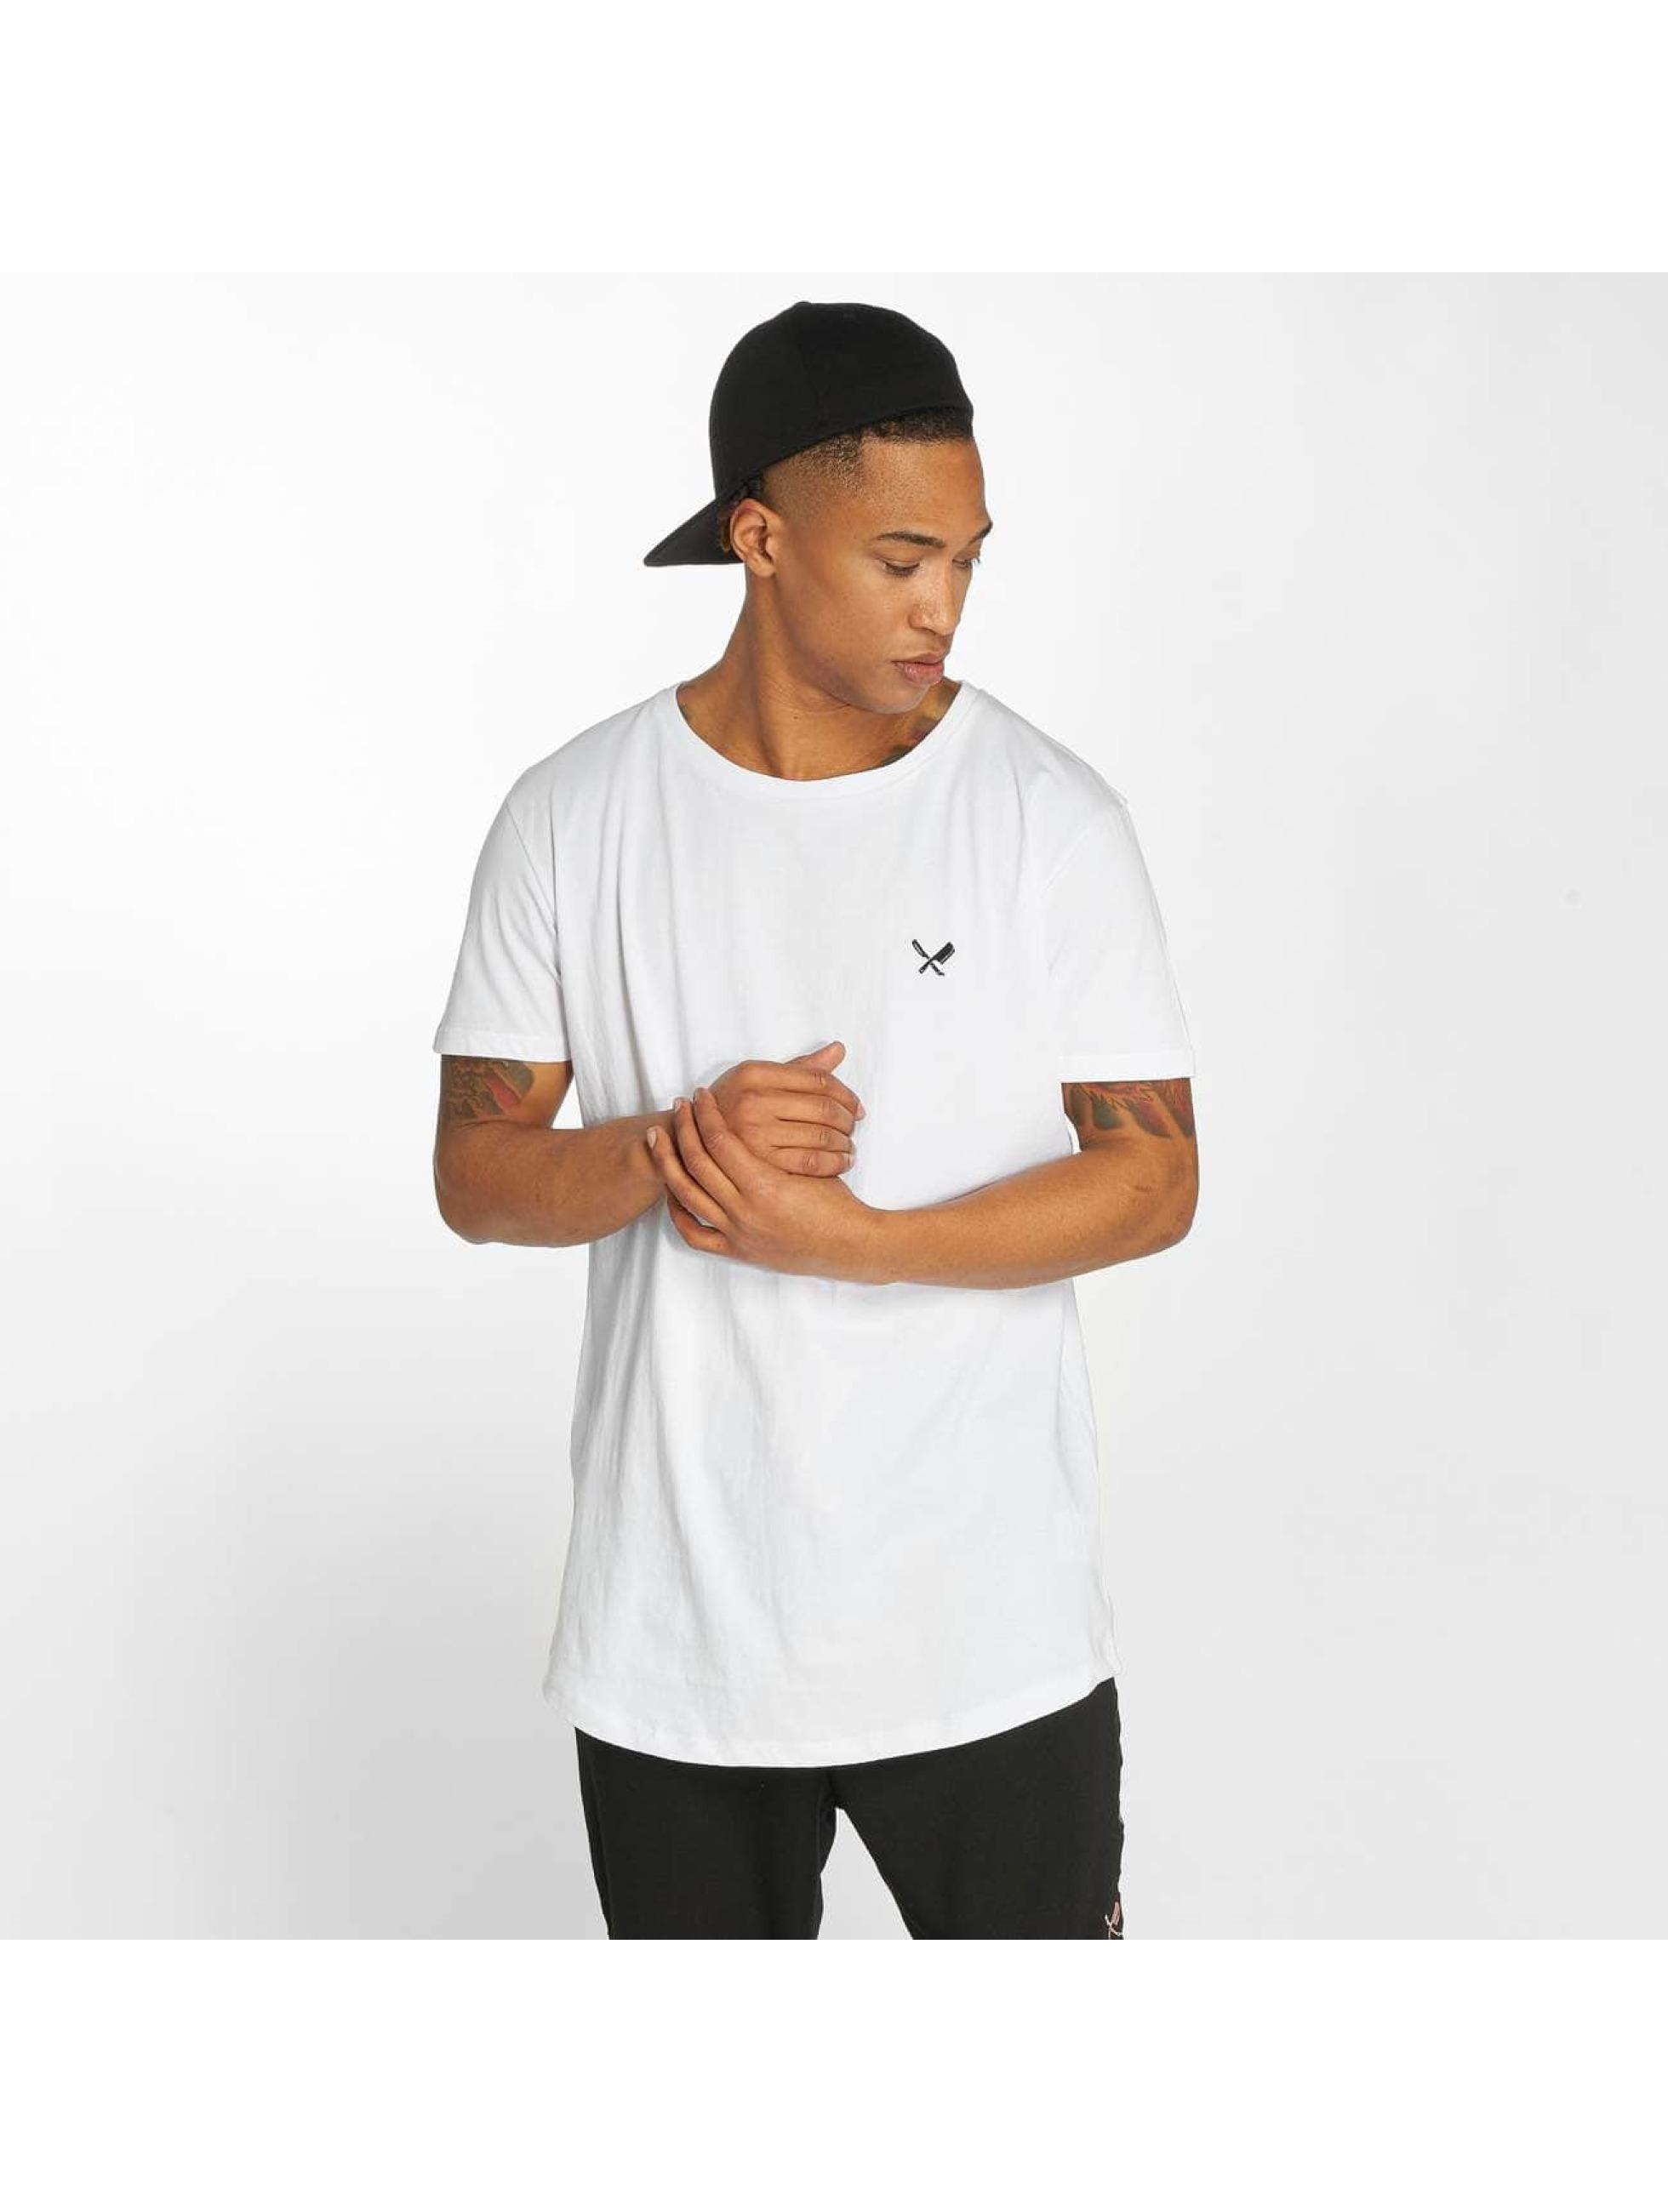 Distorted People Camiseta People Grand blanco